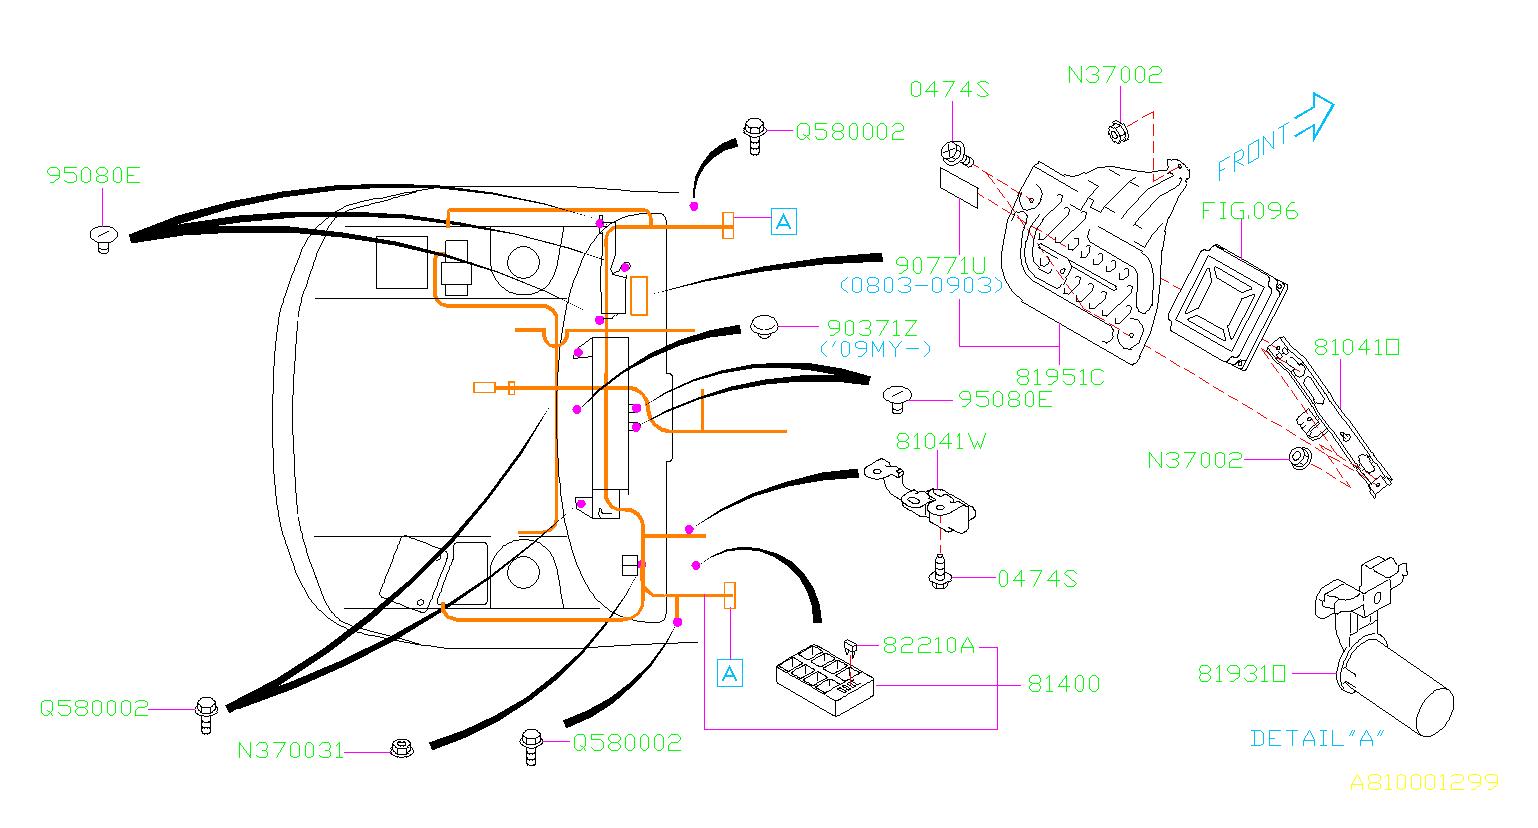 Subaru Sti Cover  Wiring  Main  Harness  Electrical